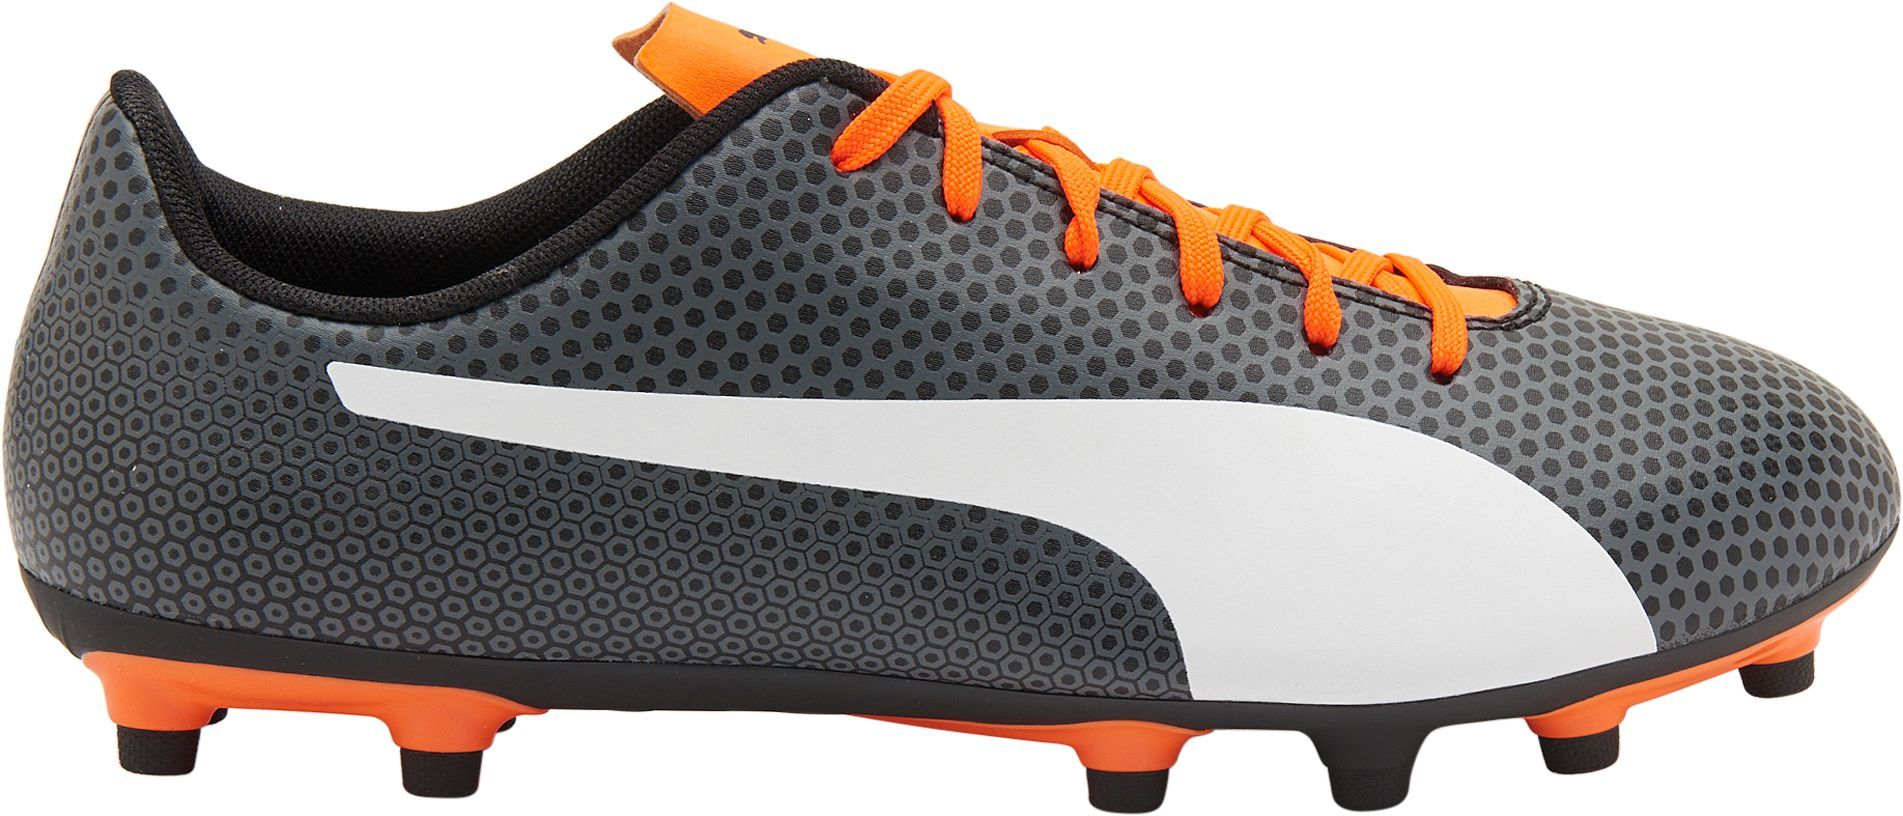 831657236a877 Puma Men's Spirit FG Soccer Cleats, Black | Products | Soccer Cleats ...